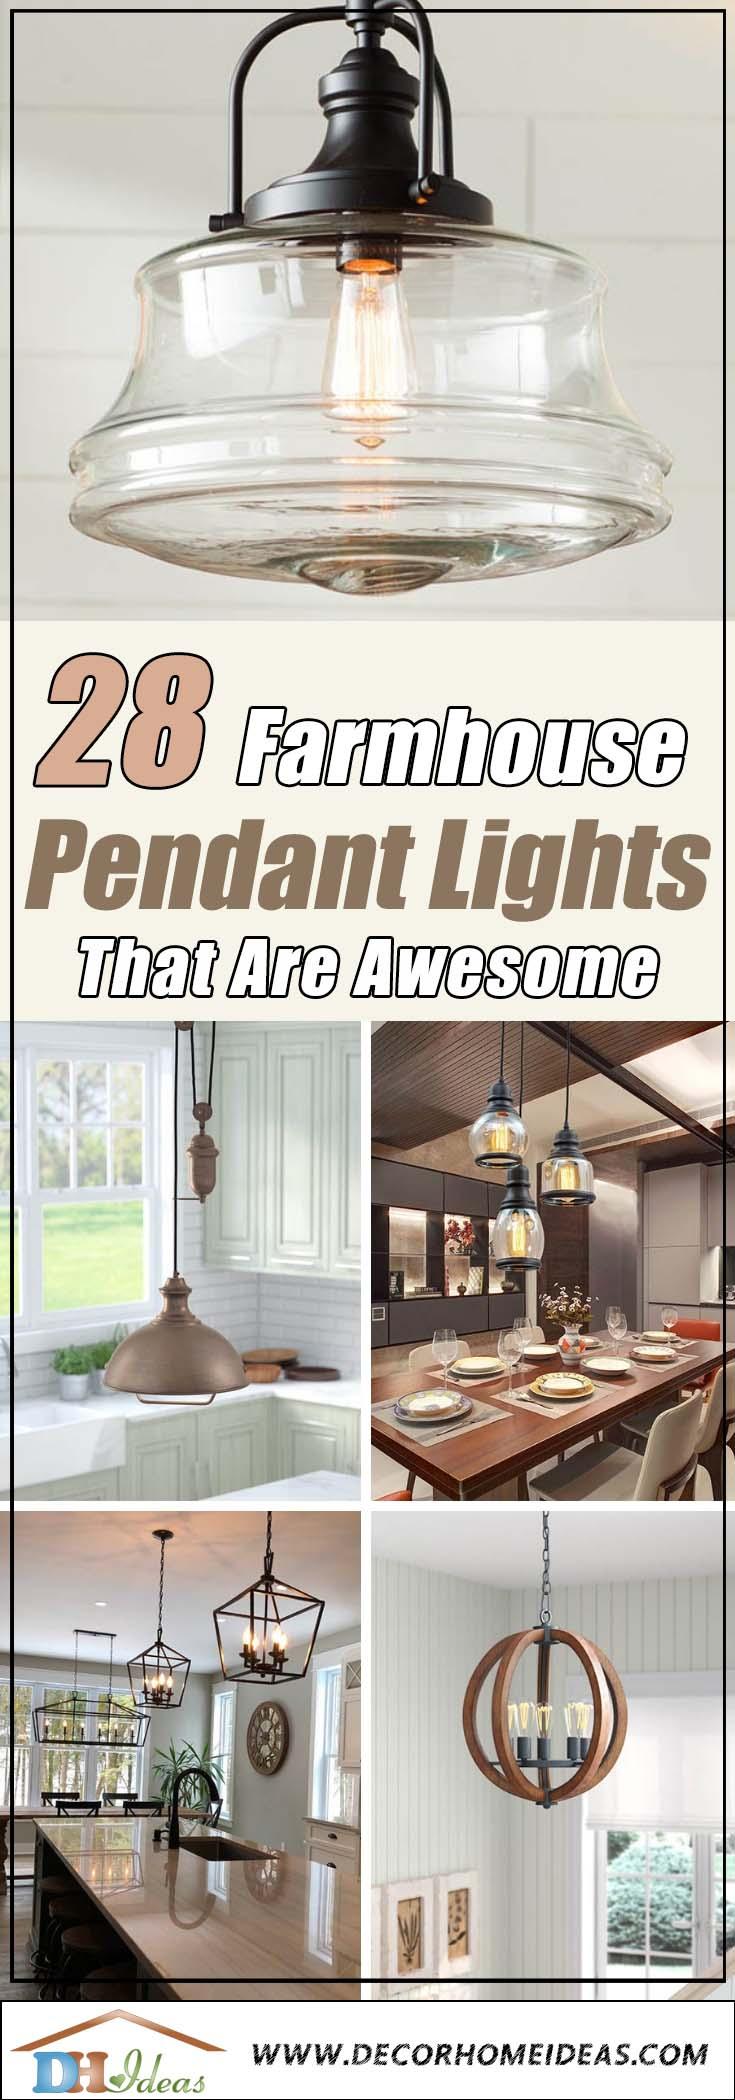 28 Best Farmhouse Pendant Lights You'll Love With Pruett Cognac 3 Light Cluster Bell Pendants (View 20 of 30)